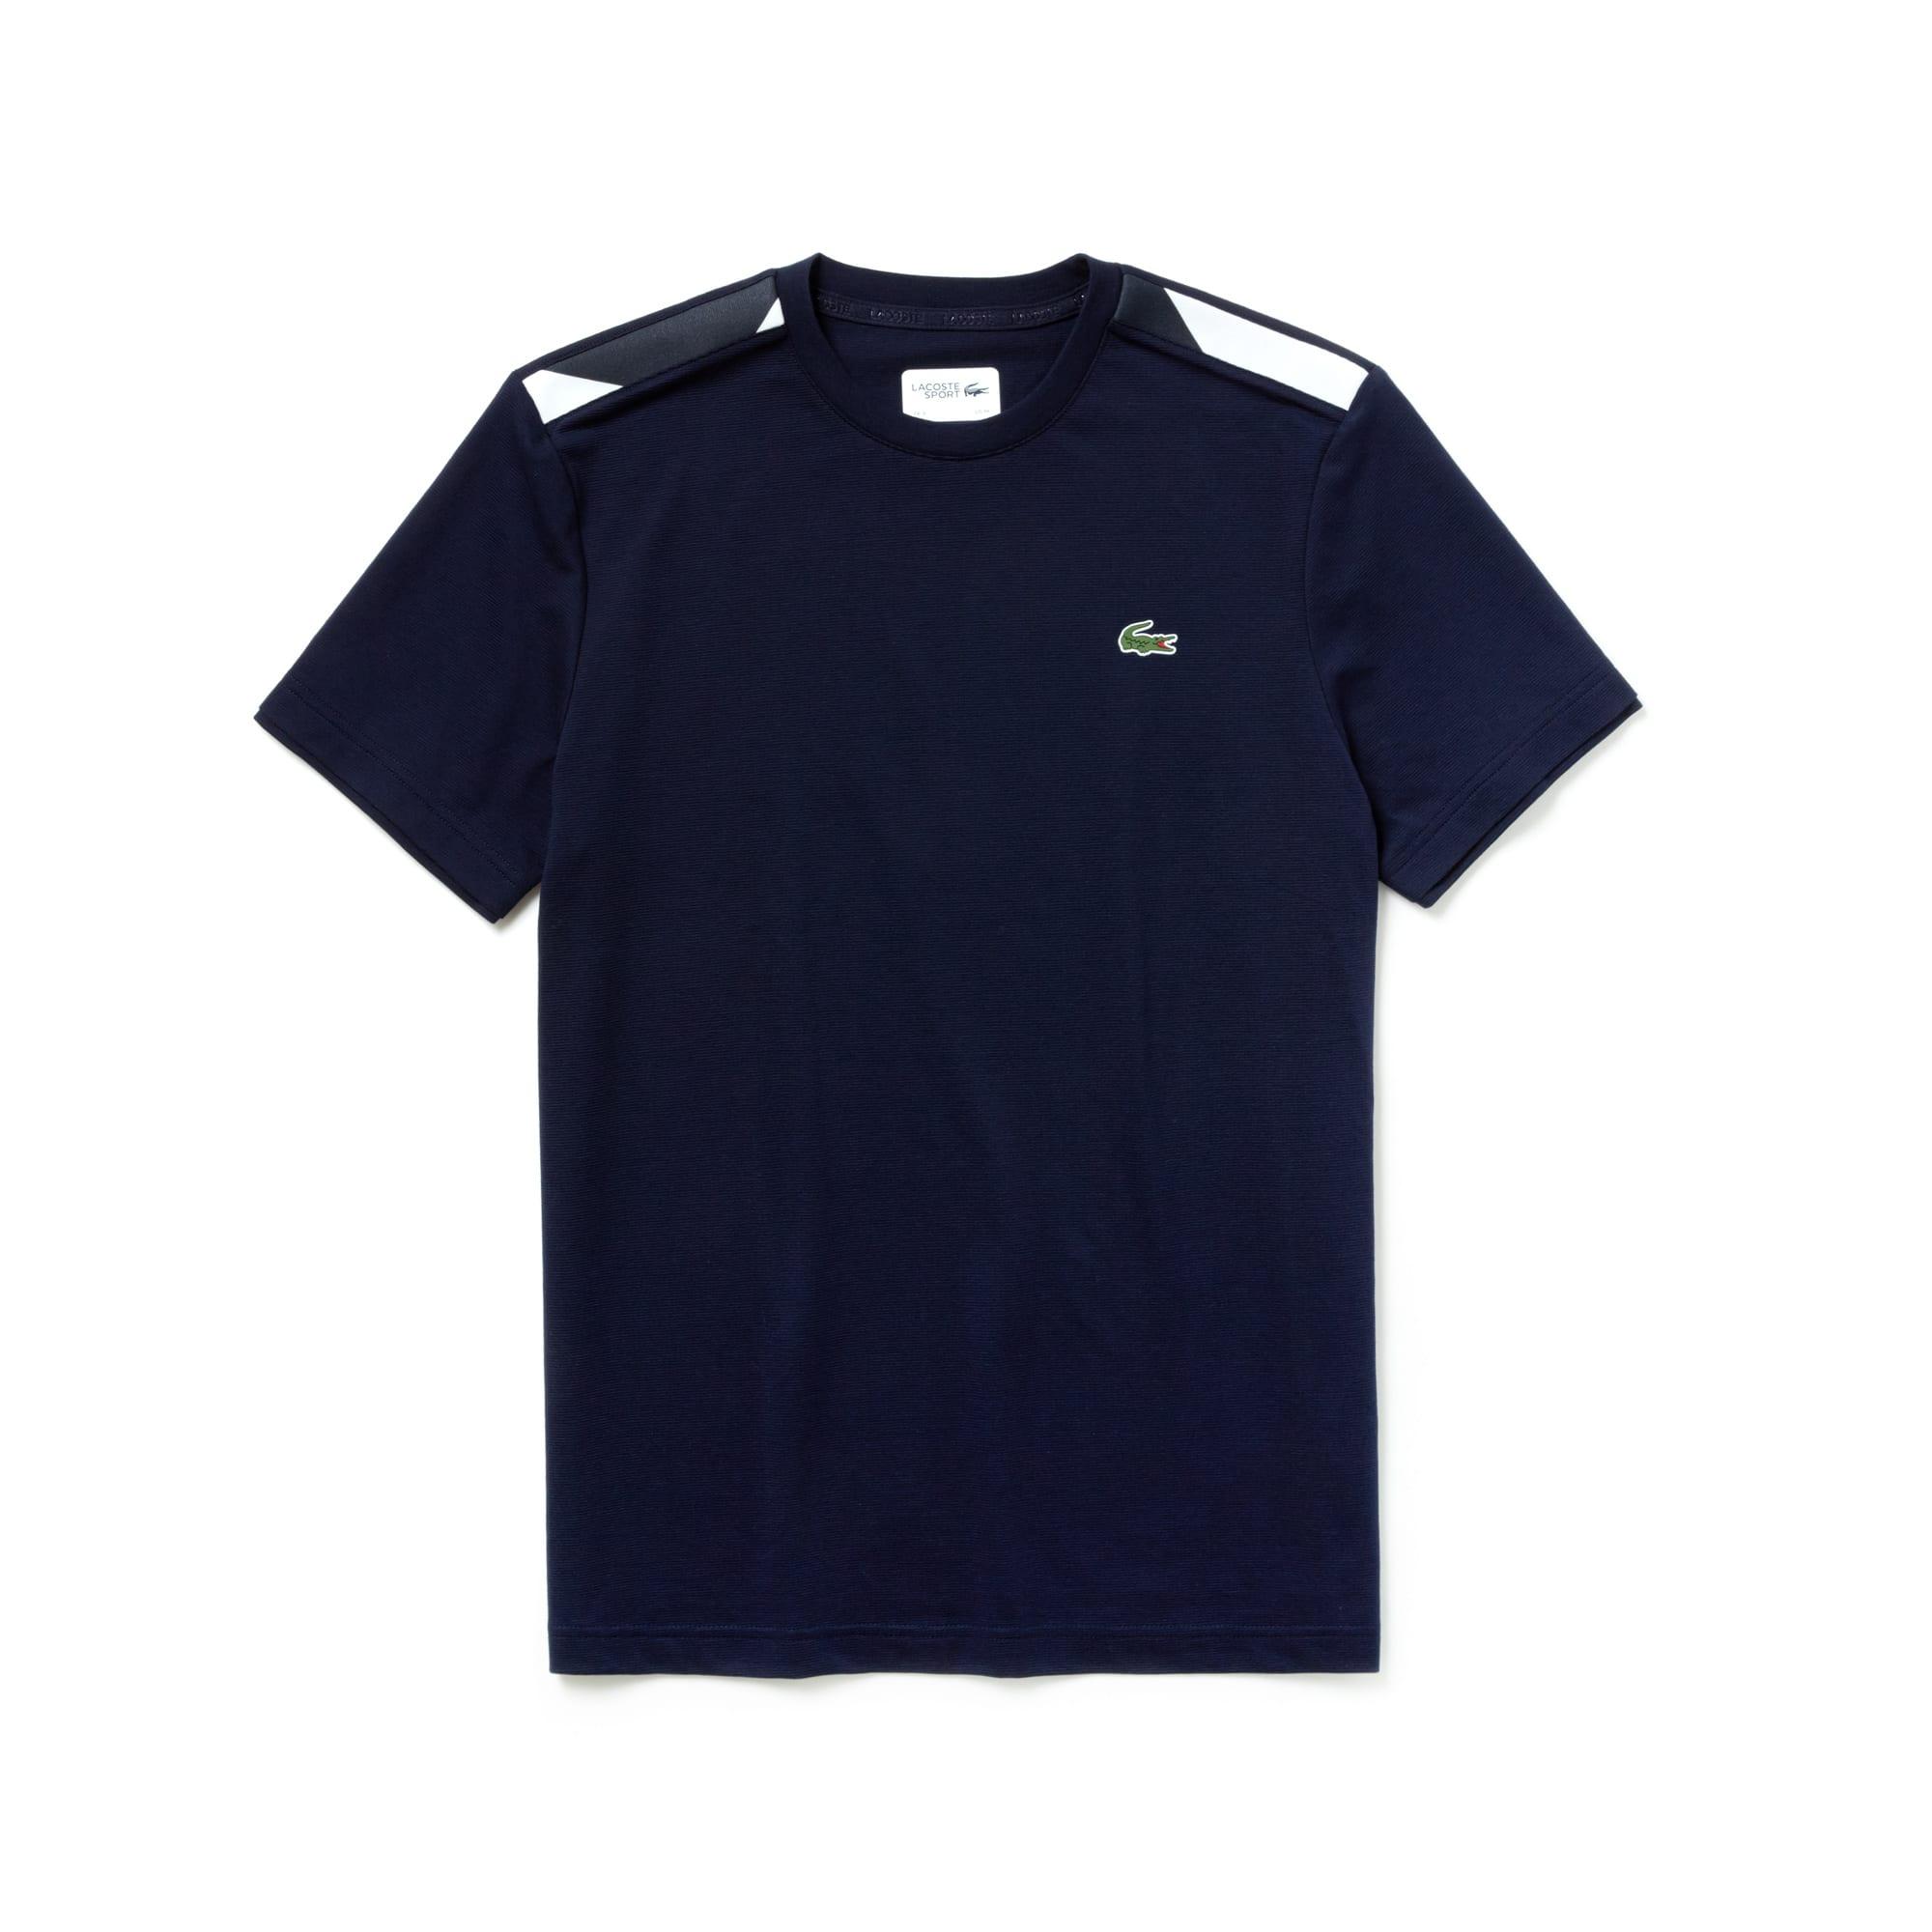 Camiseta De Hombre Lacoste SPORT Tennis En Algodón Con Detalles A Contraste